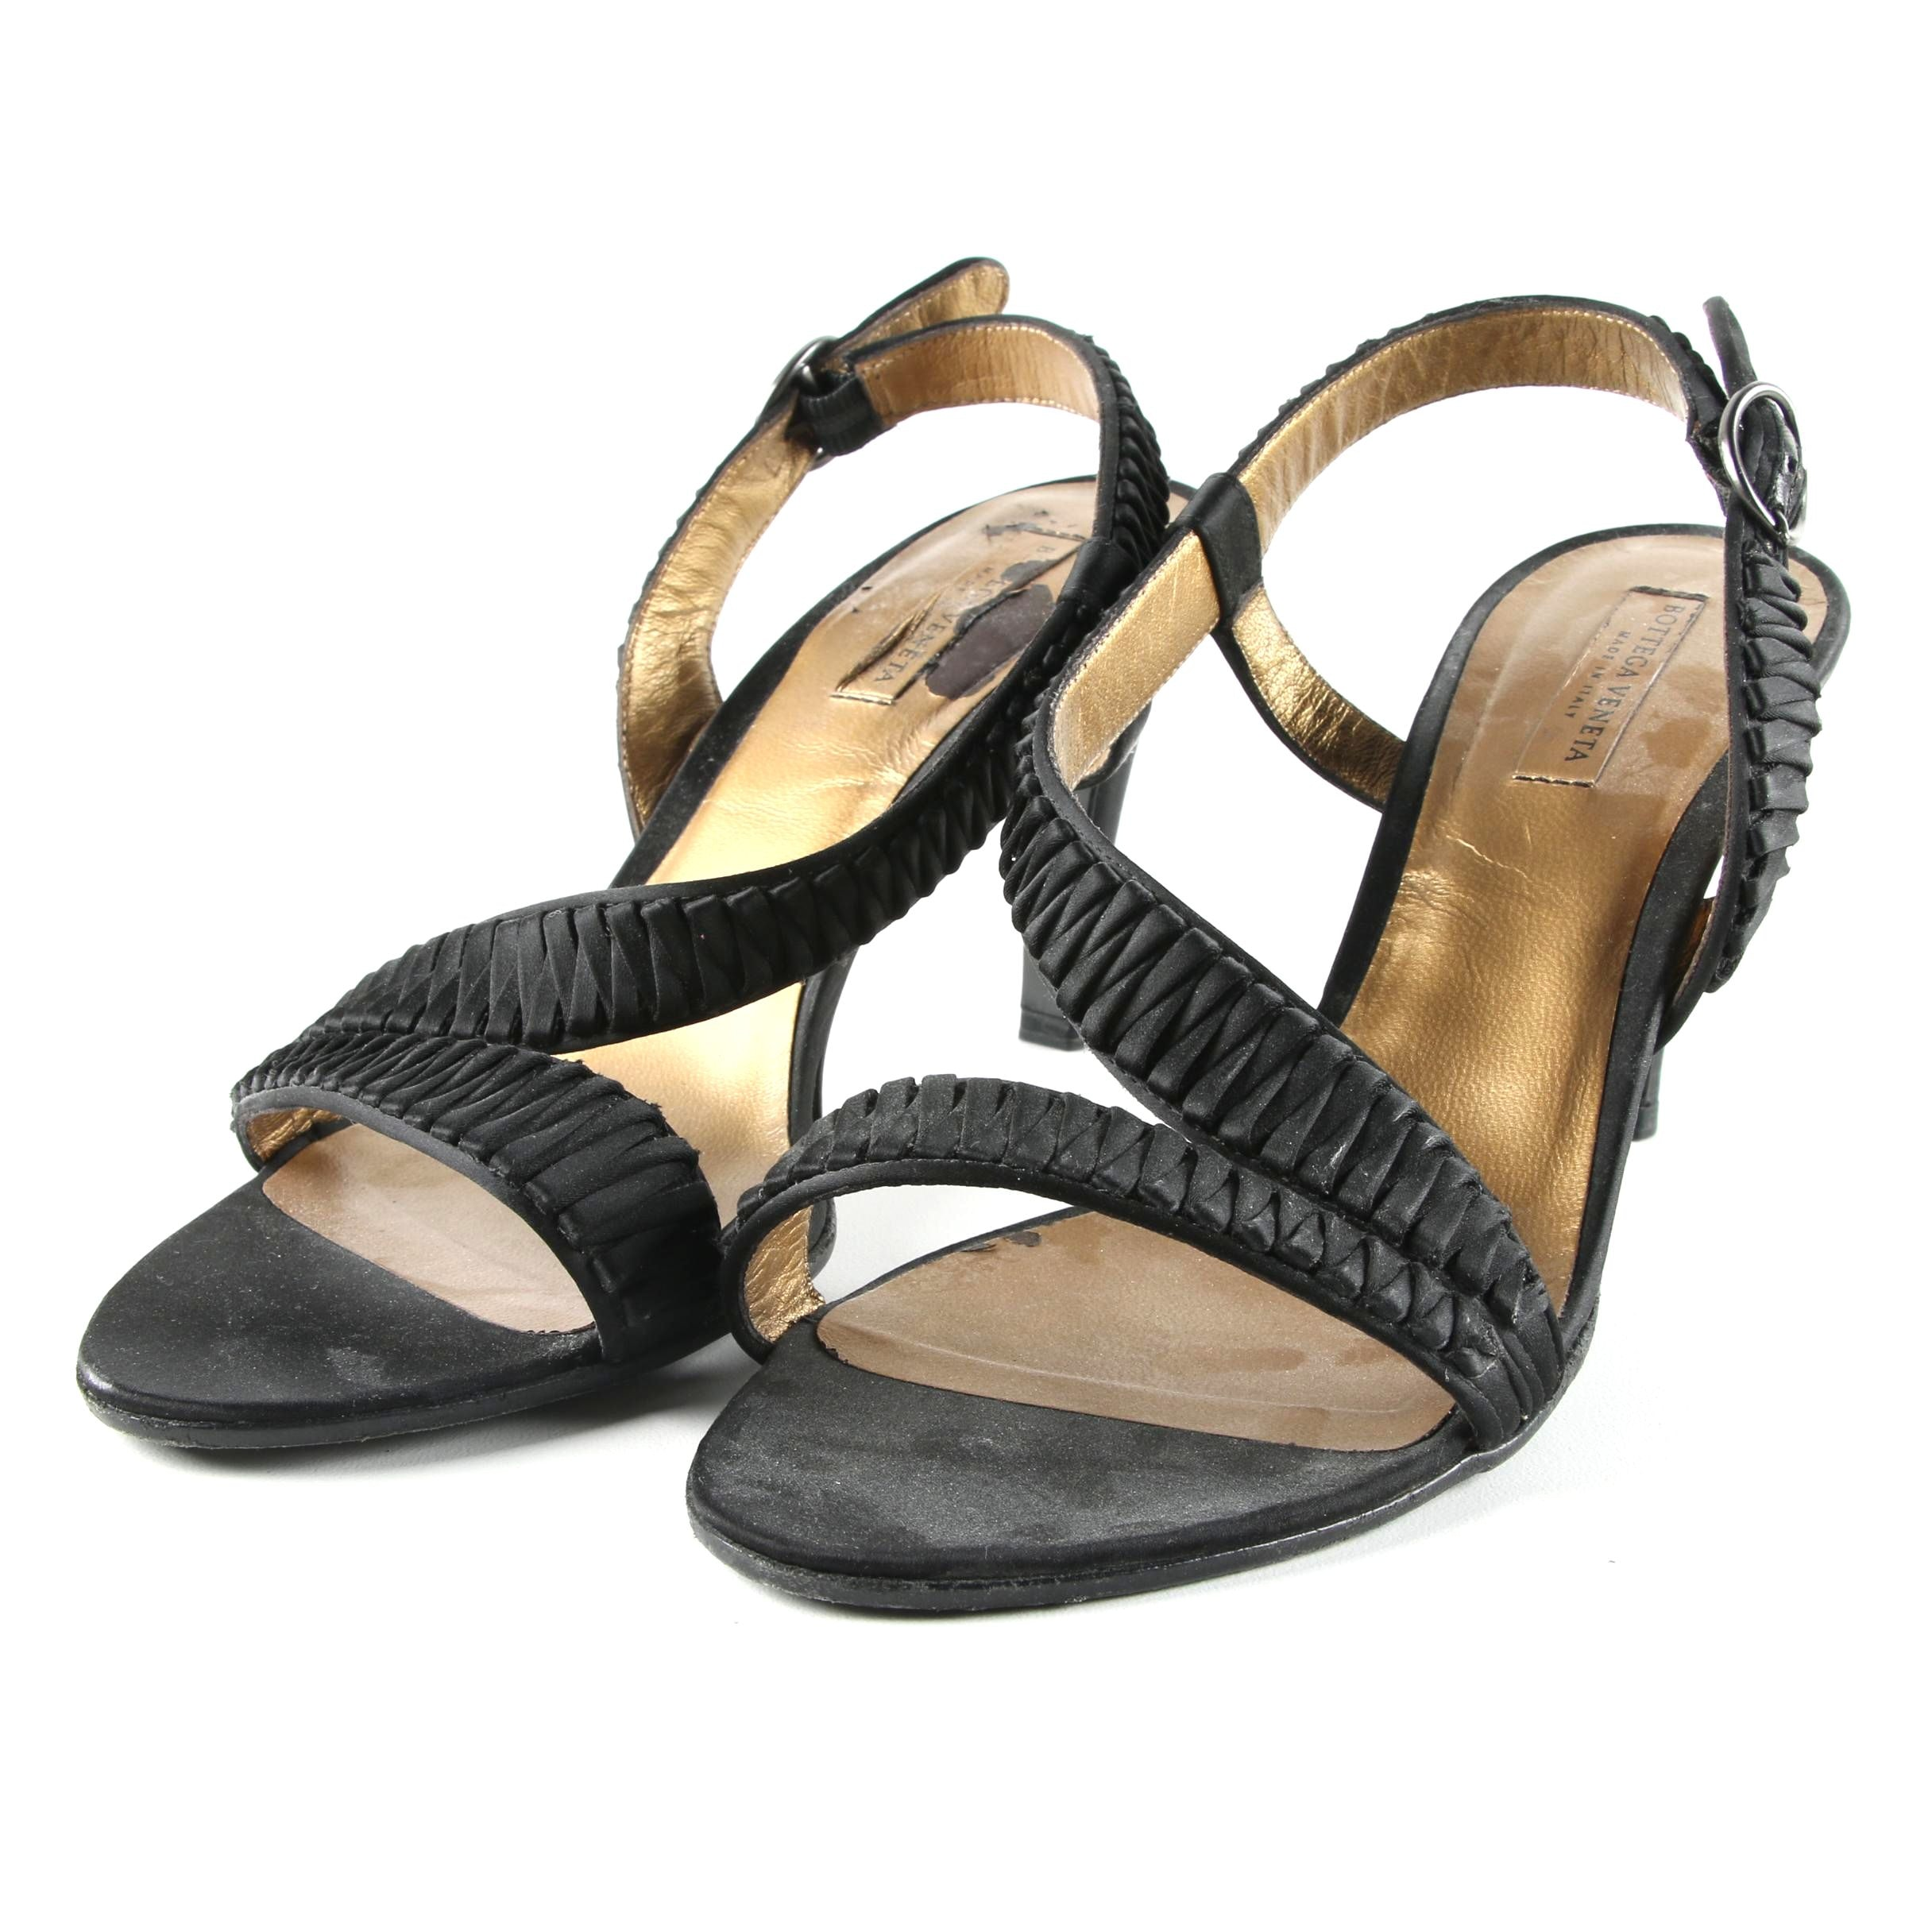 Bottega Veneta Black Fabric High-Heeled Dress Sandals, Made in Italy